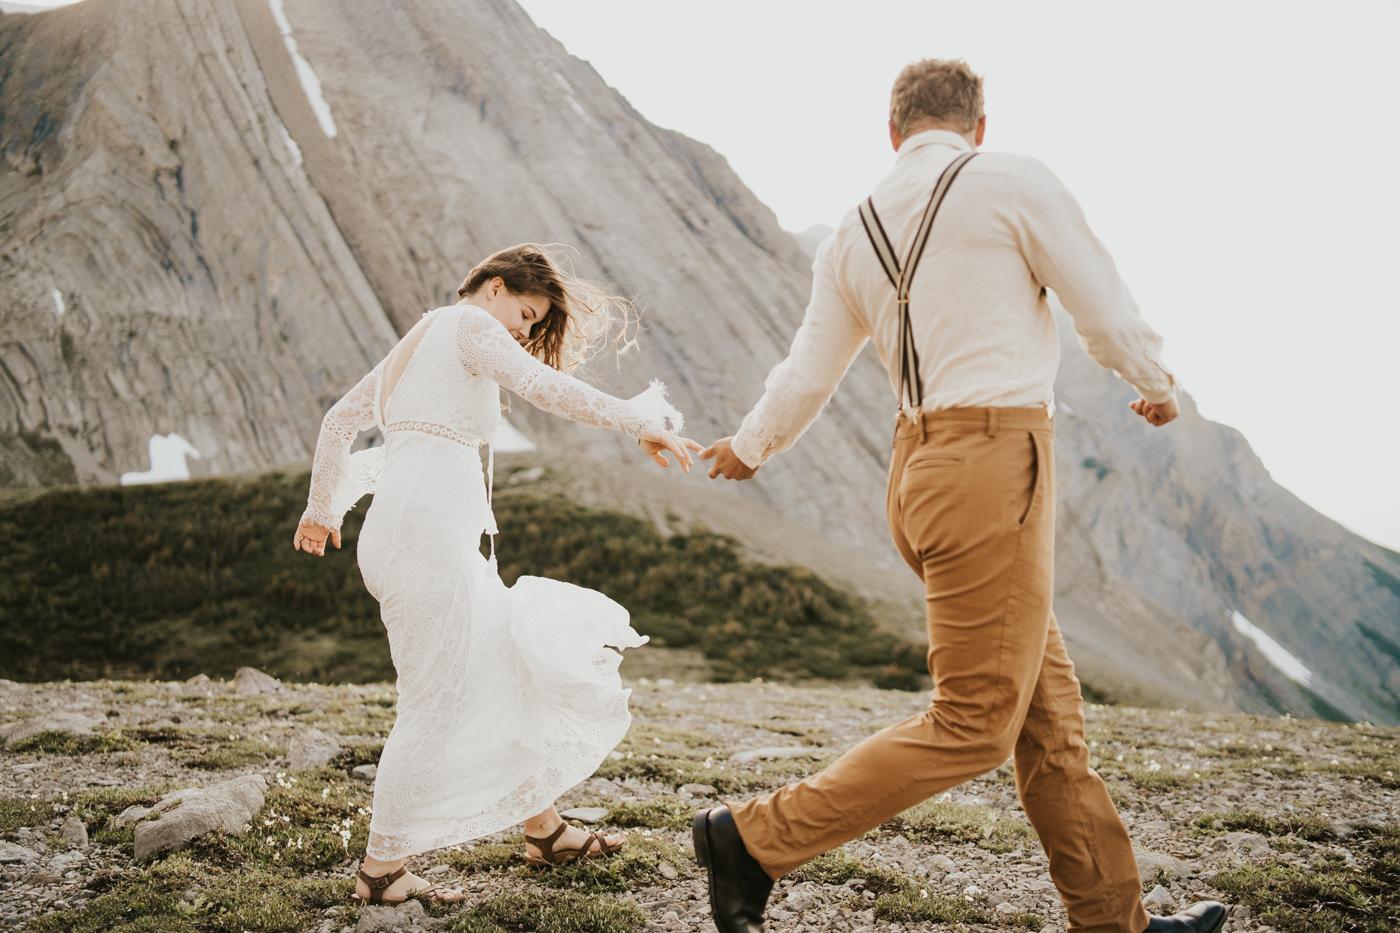 tyraephotography_photographer_wedding_elopement_engagement_photography-08100.jpg